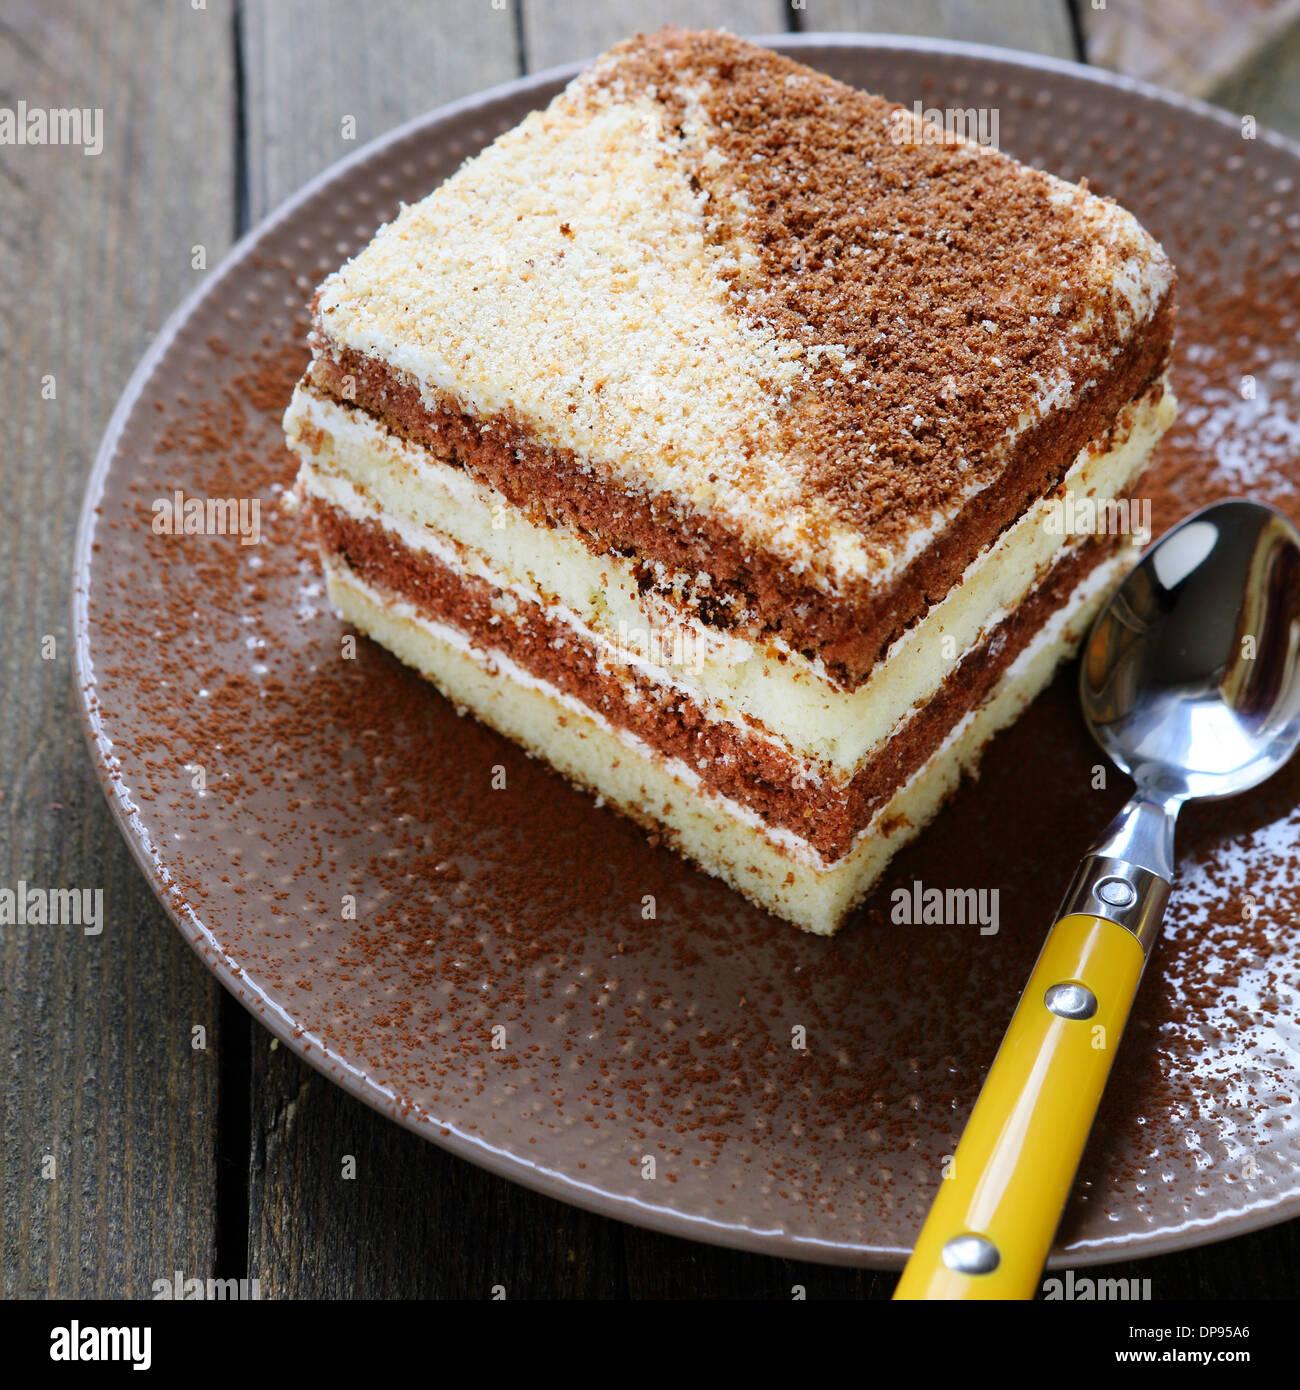 piece of cake on a plate food closeup & piece of cake on a plate food closeup Stock Photo: 65355310 - Alamy